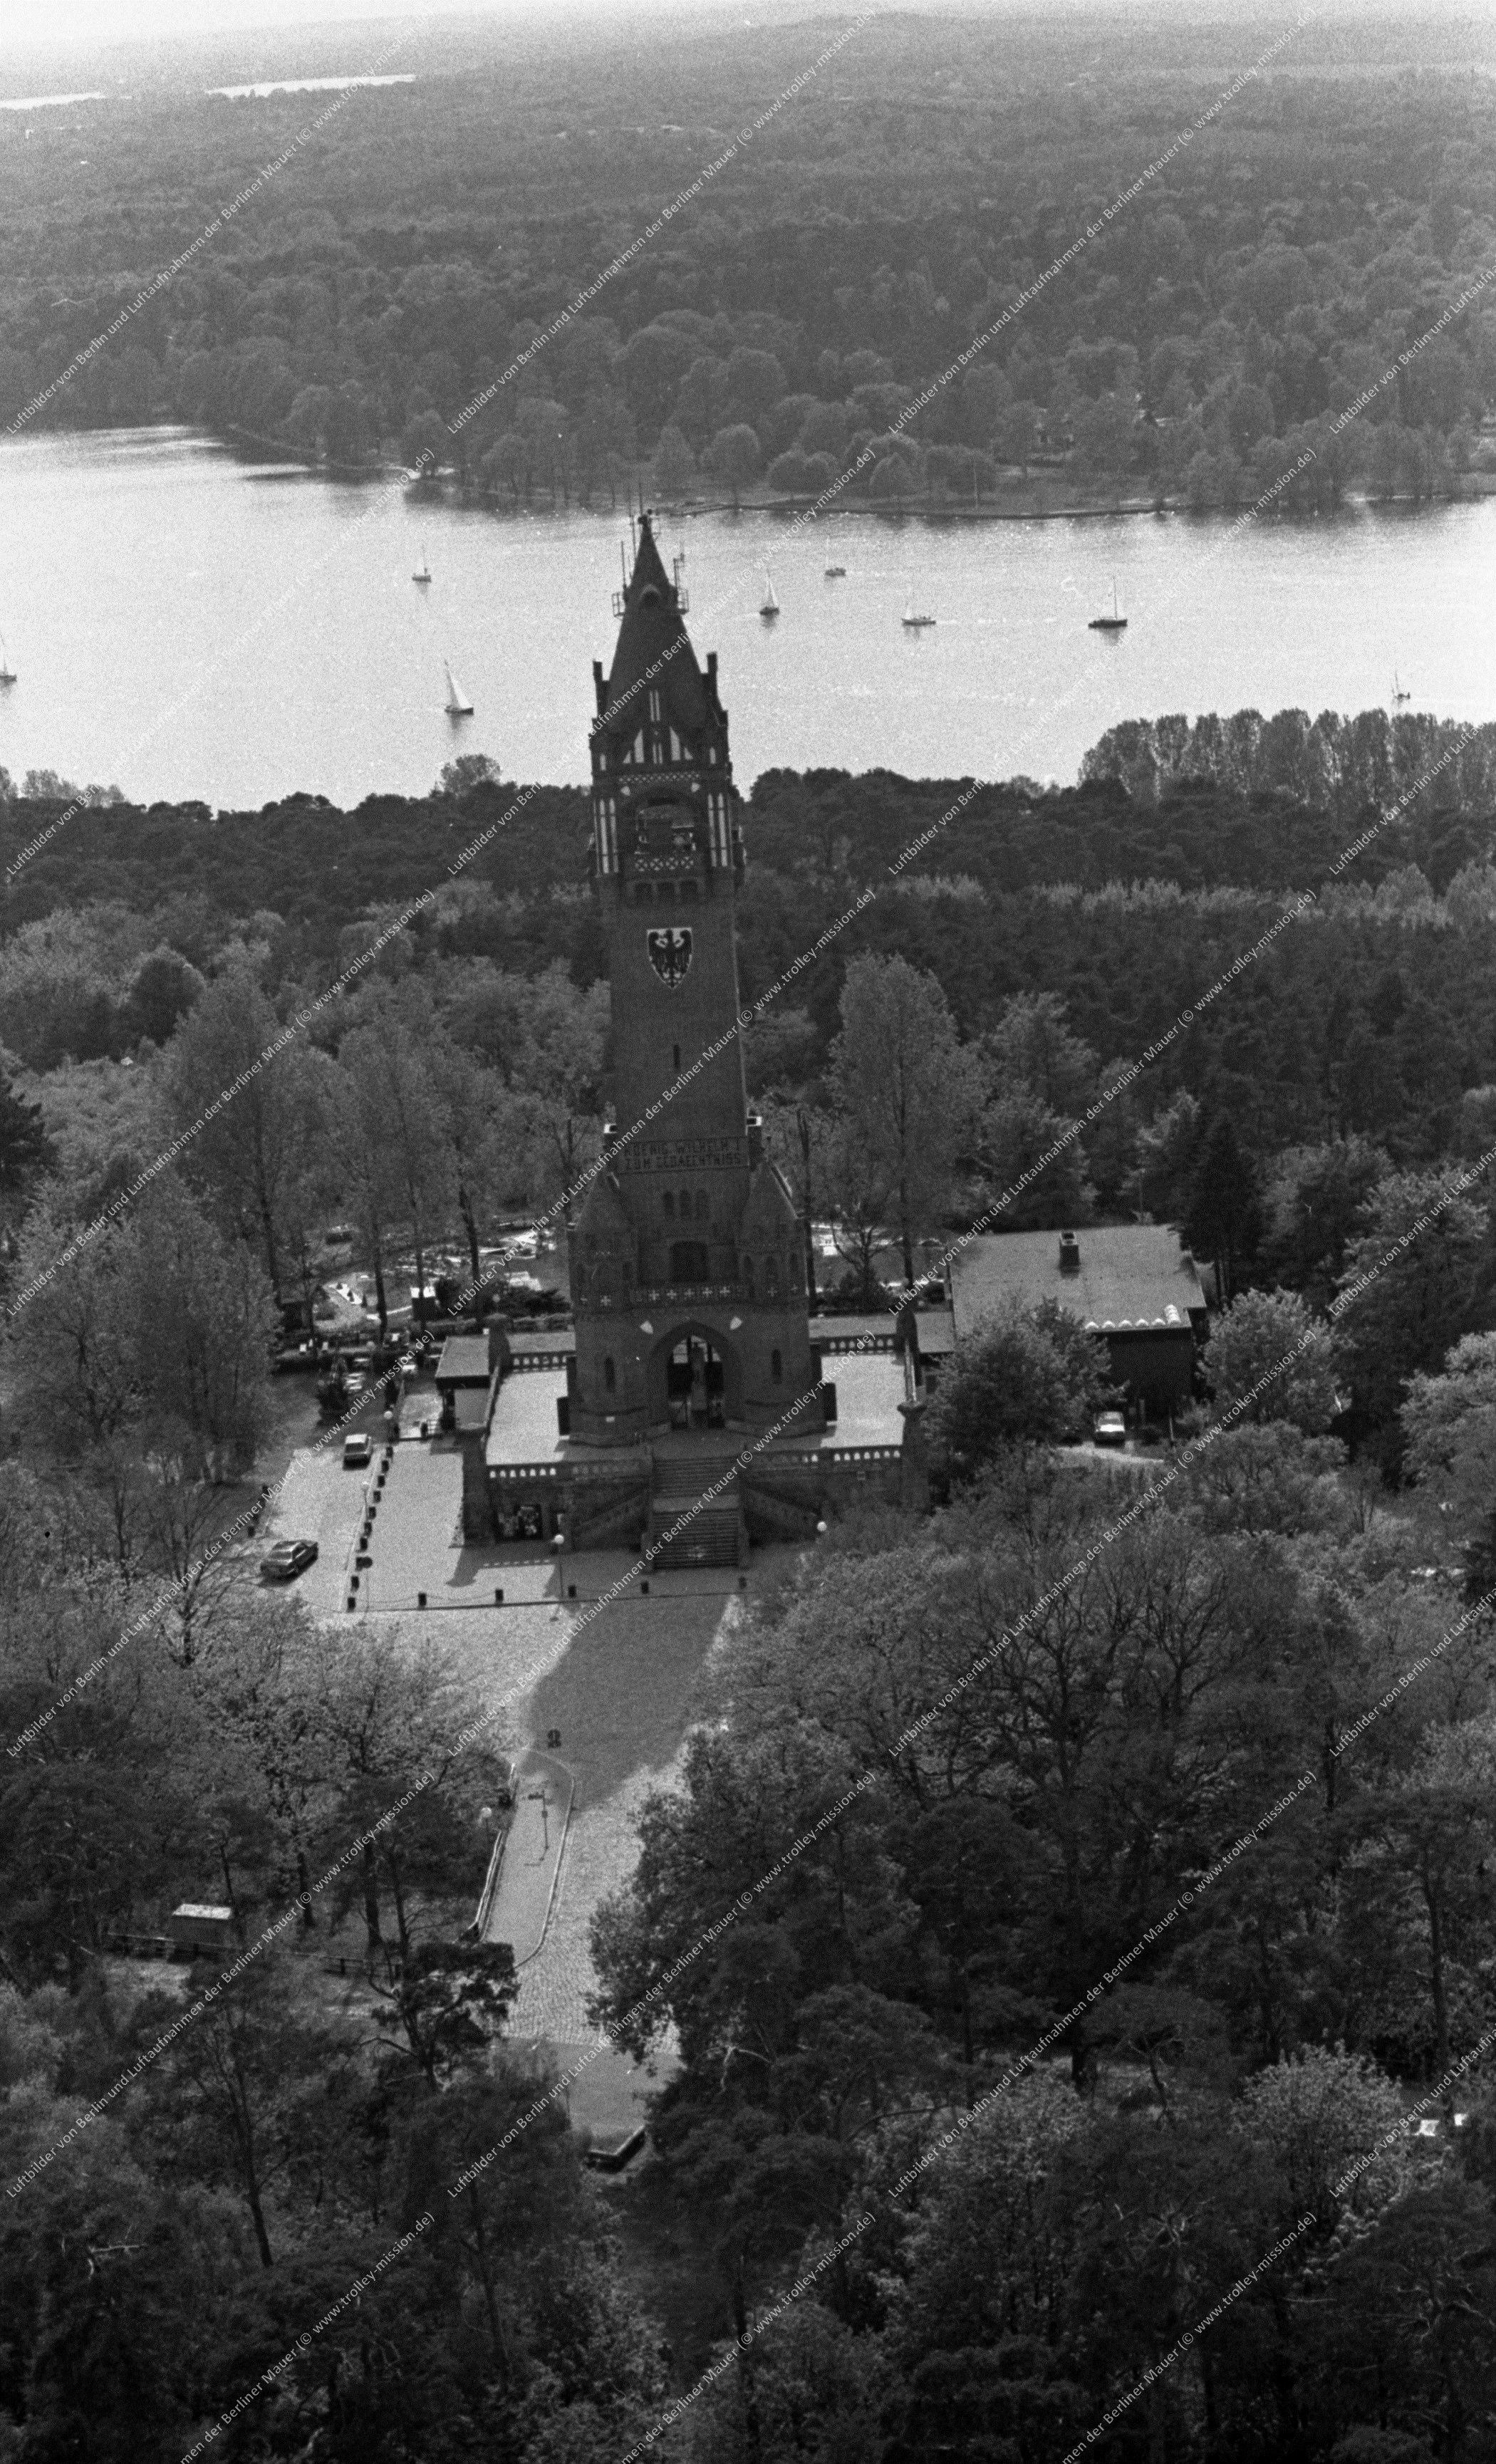 Berlin Luftbildaufnahme Grunewaldturm vom 12. Mai 1982 (Bild 109)